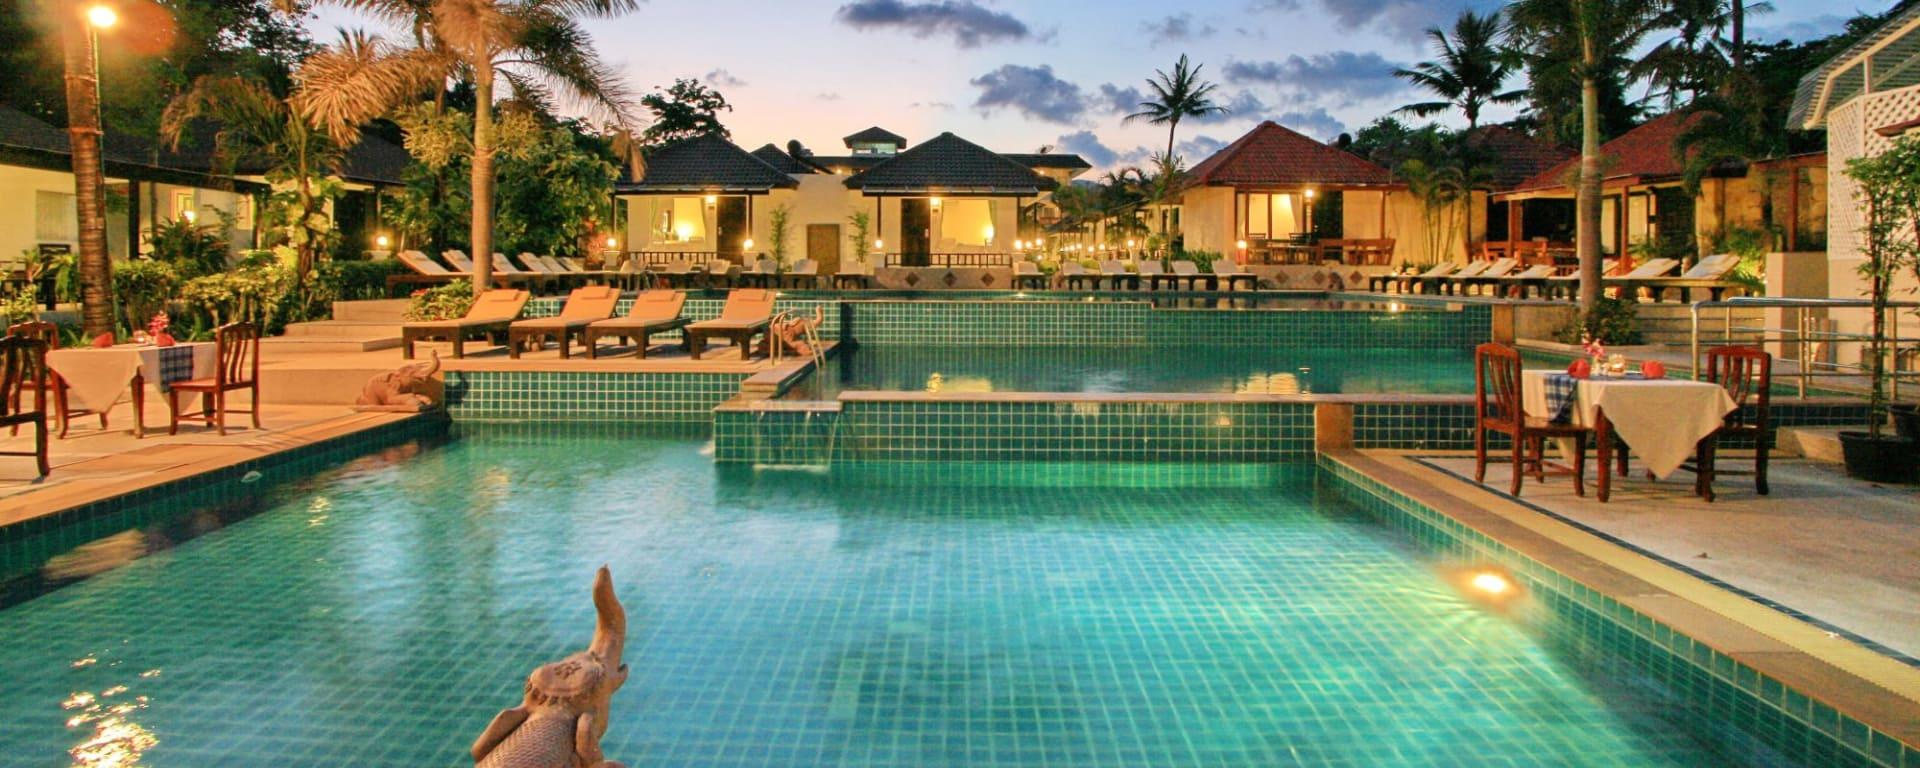 Chaweng Cove Beach Resort in Ko Samui: Pool